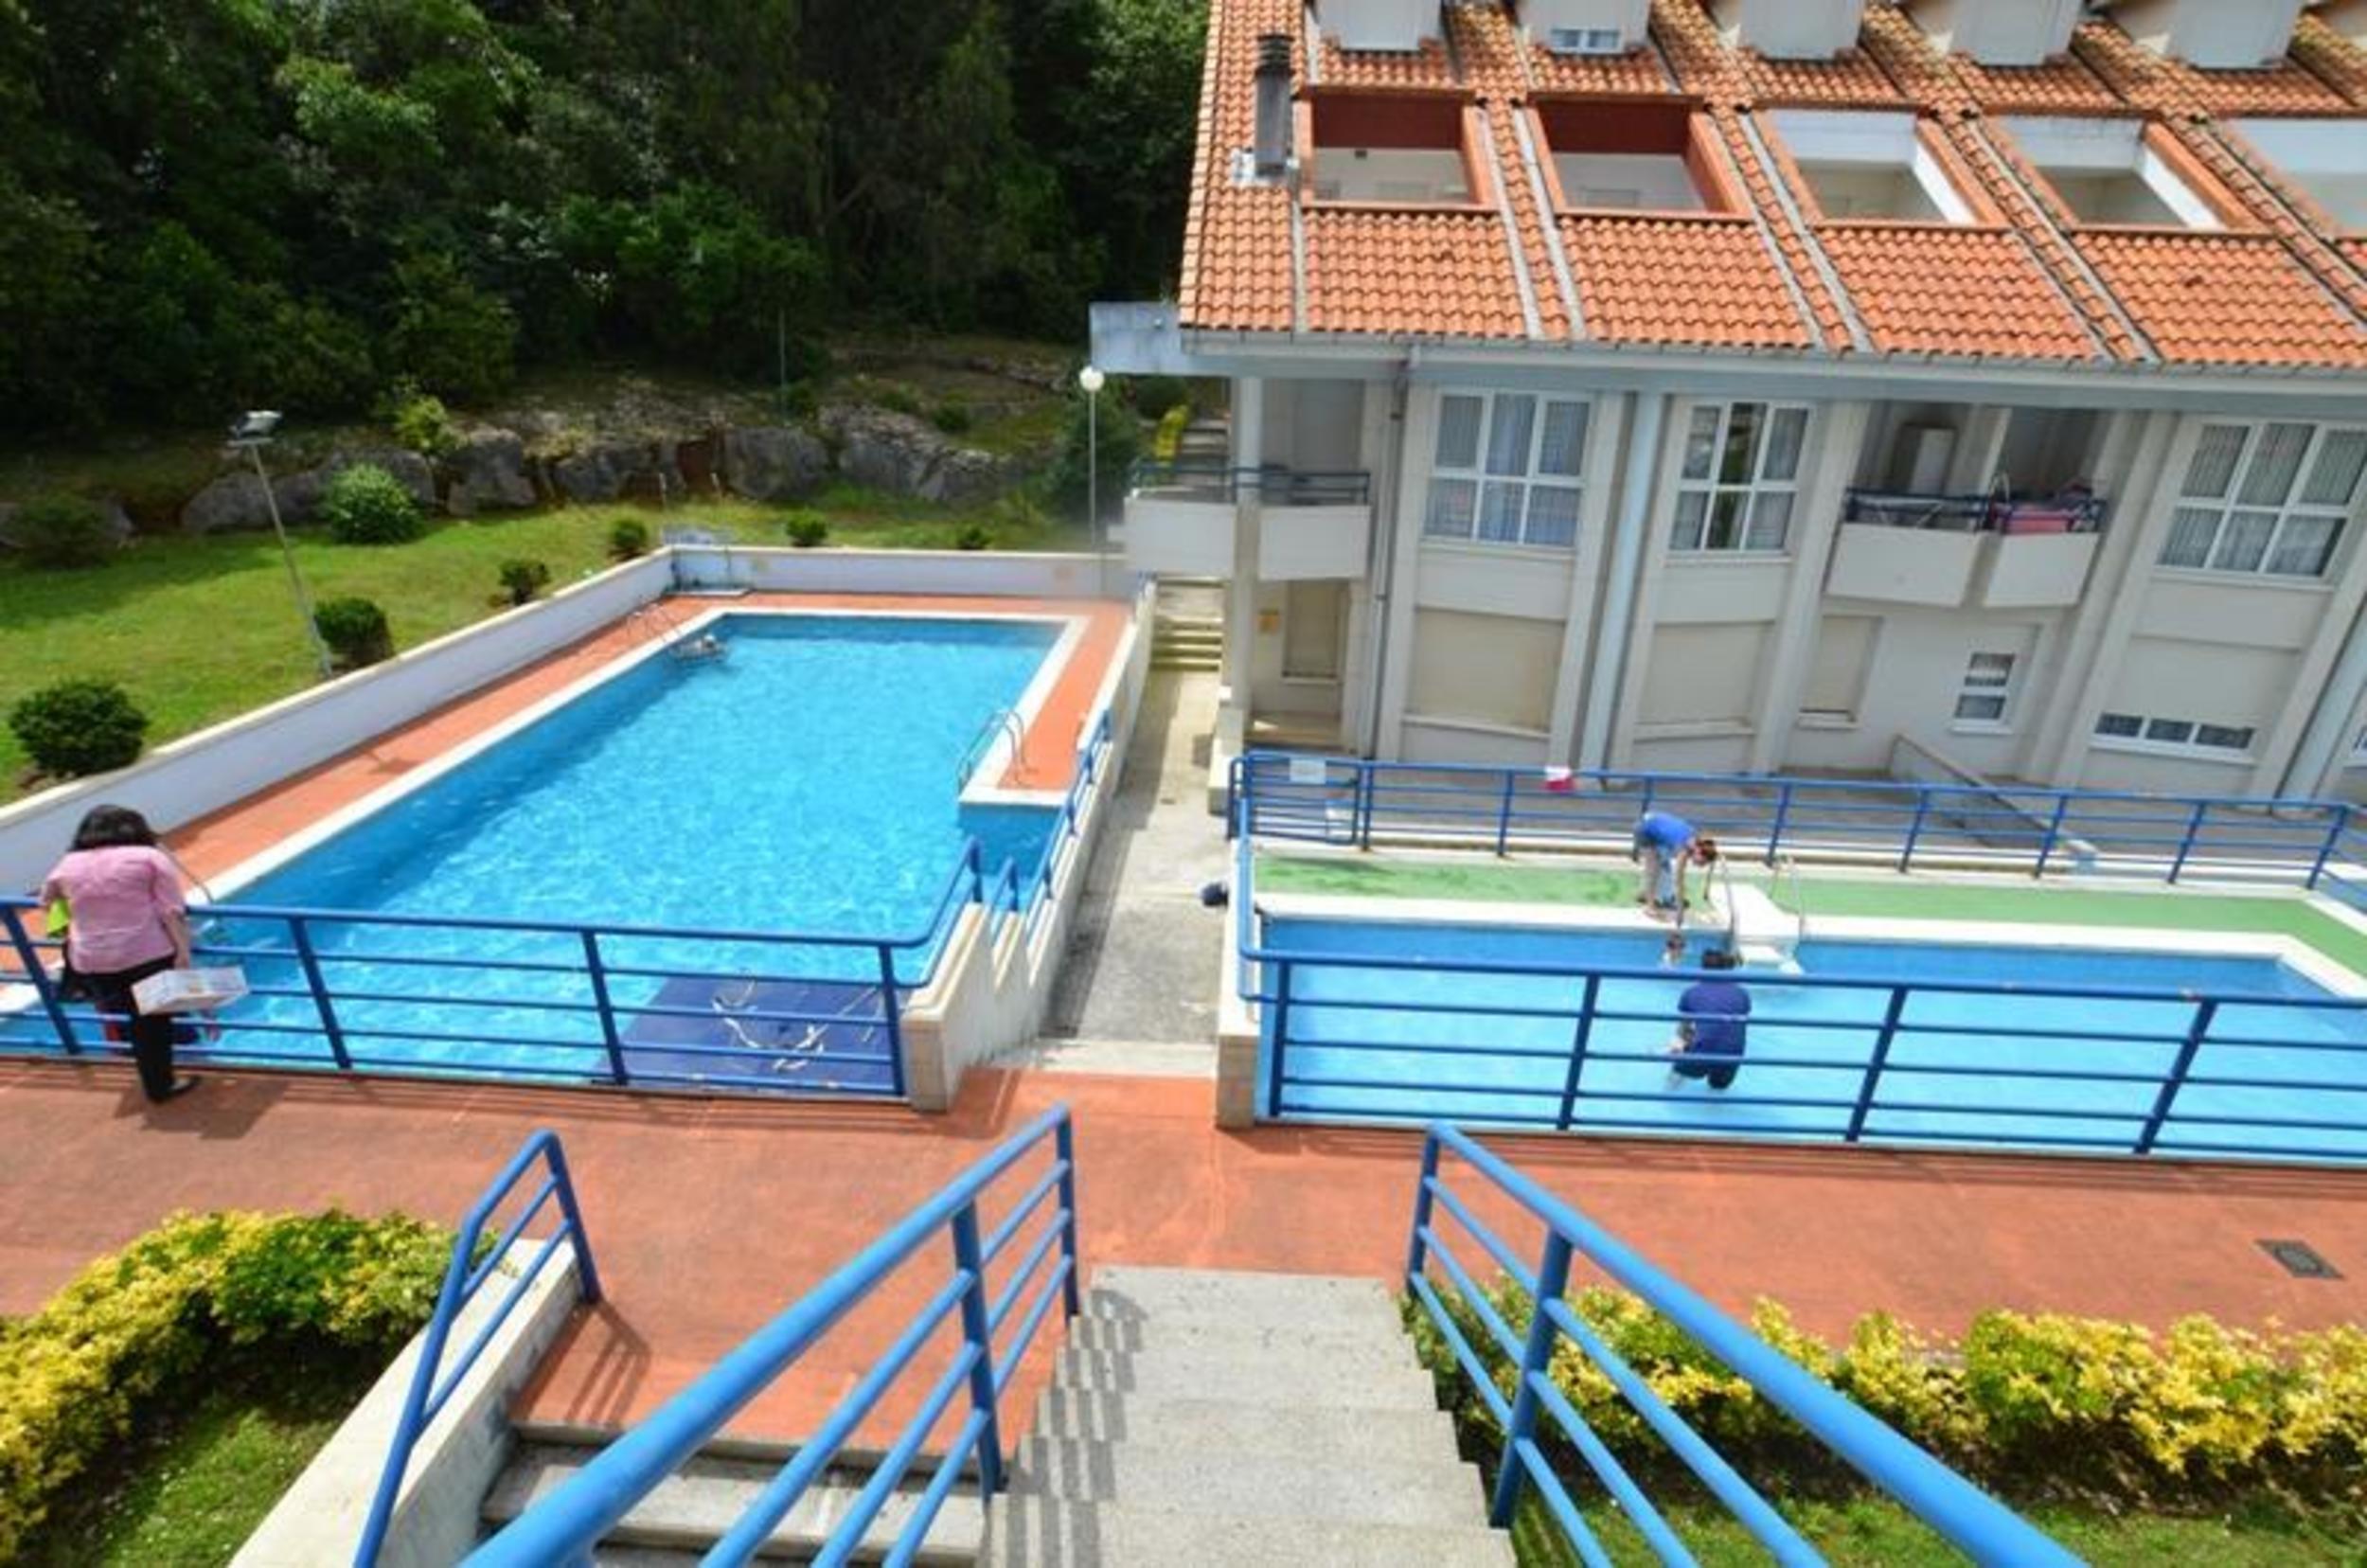 Ferienwohnung Apartment - 2 Bedrooms with Pool and Sea views - 102766 (2360874), Isla, Costa de Cantabria, Kantabrien, Spanien, Bild 9